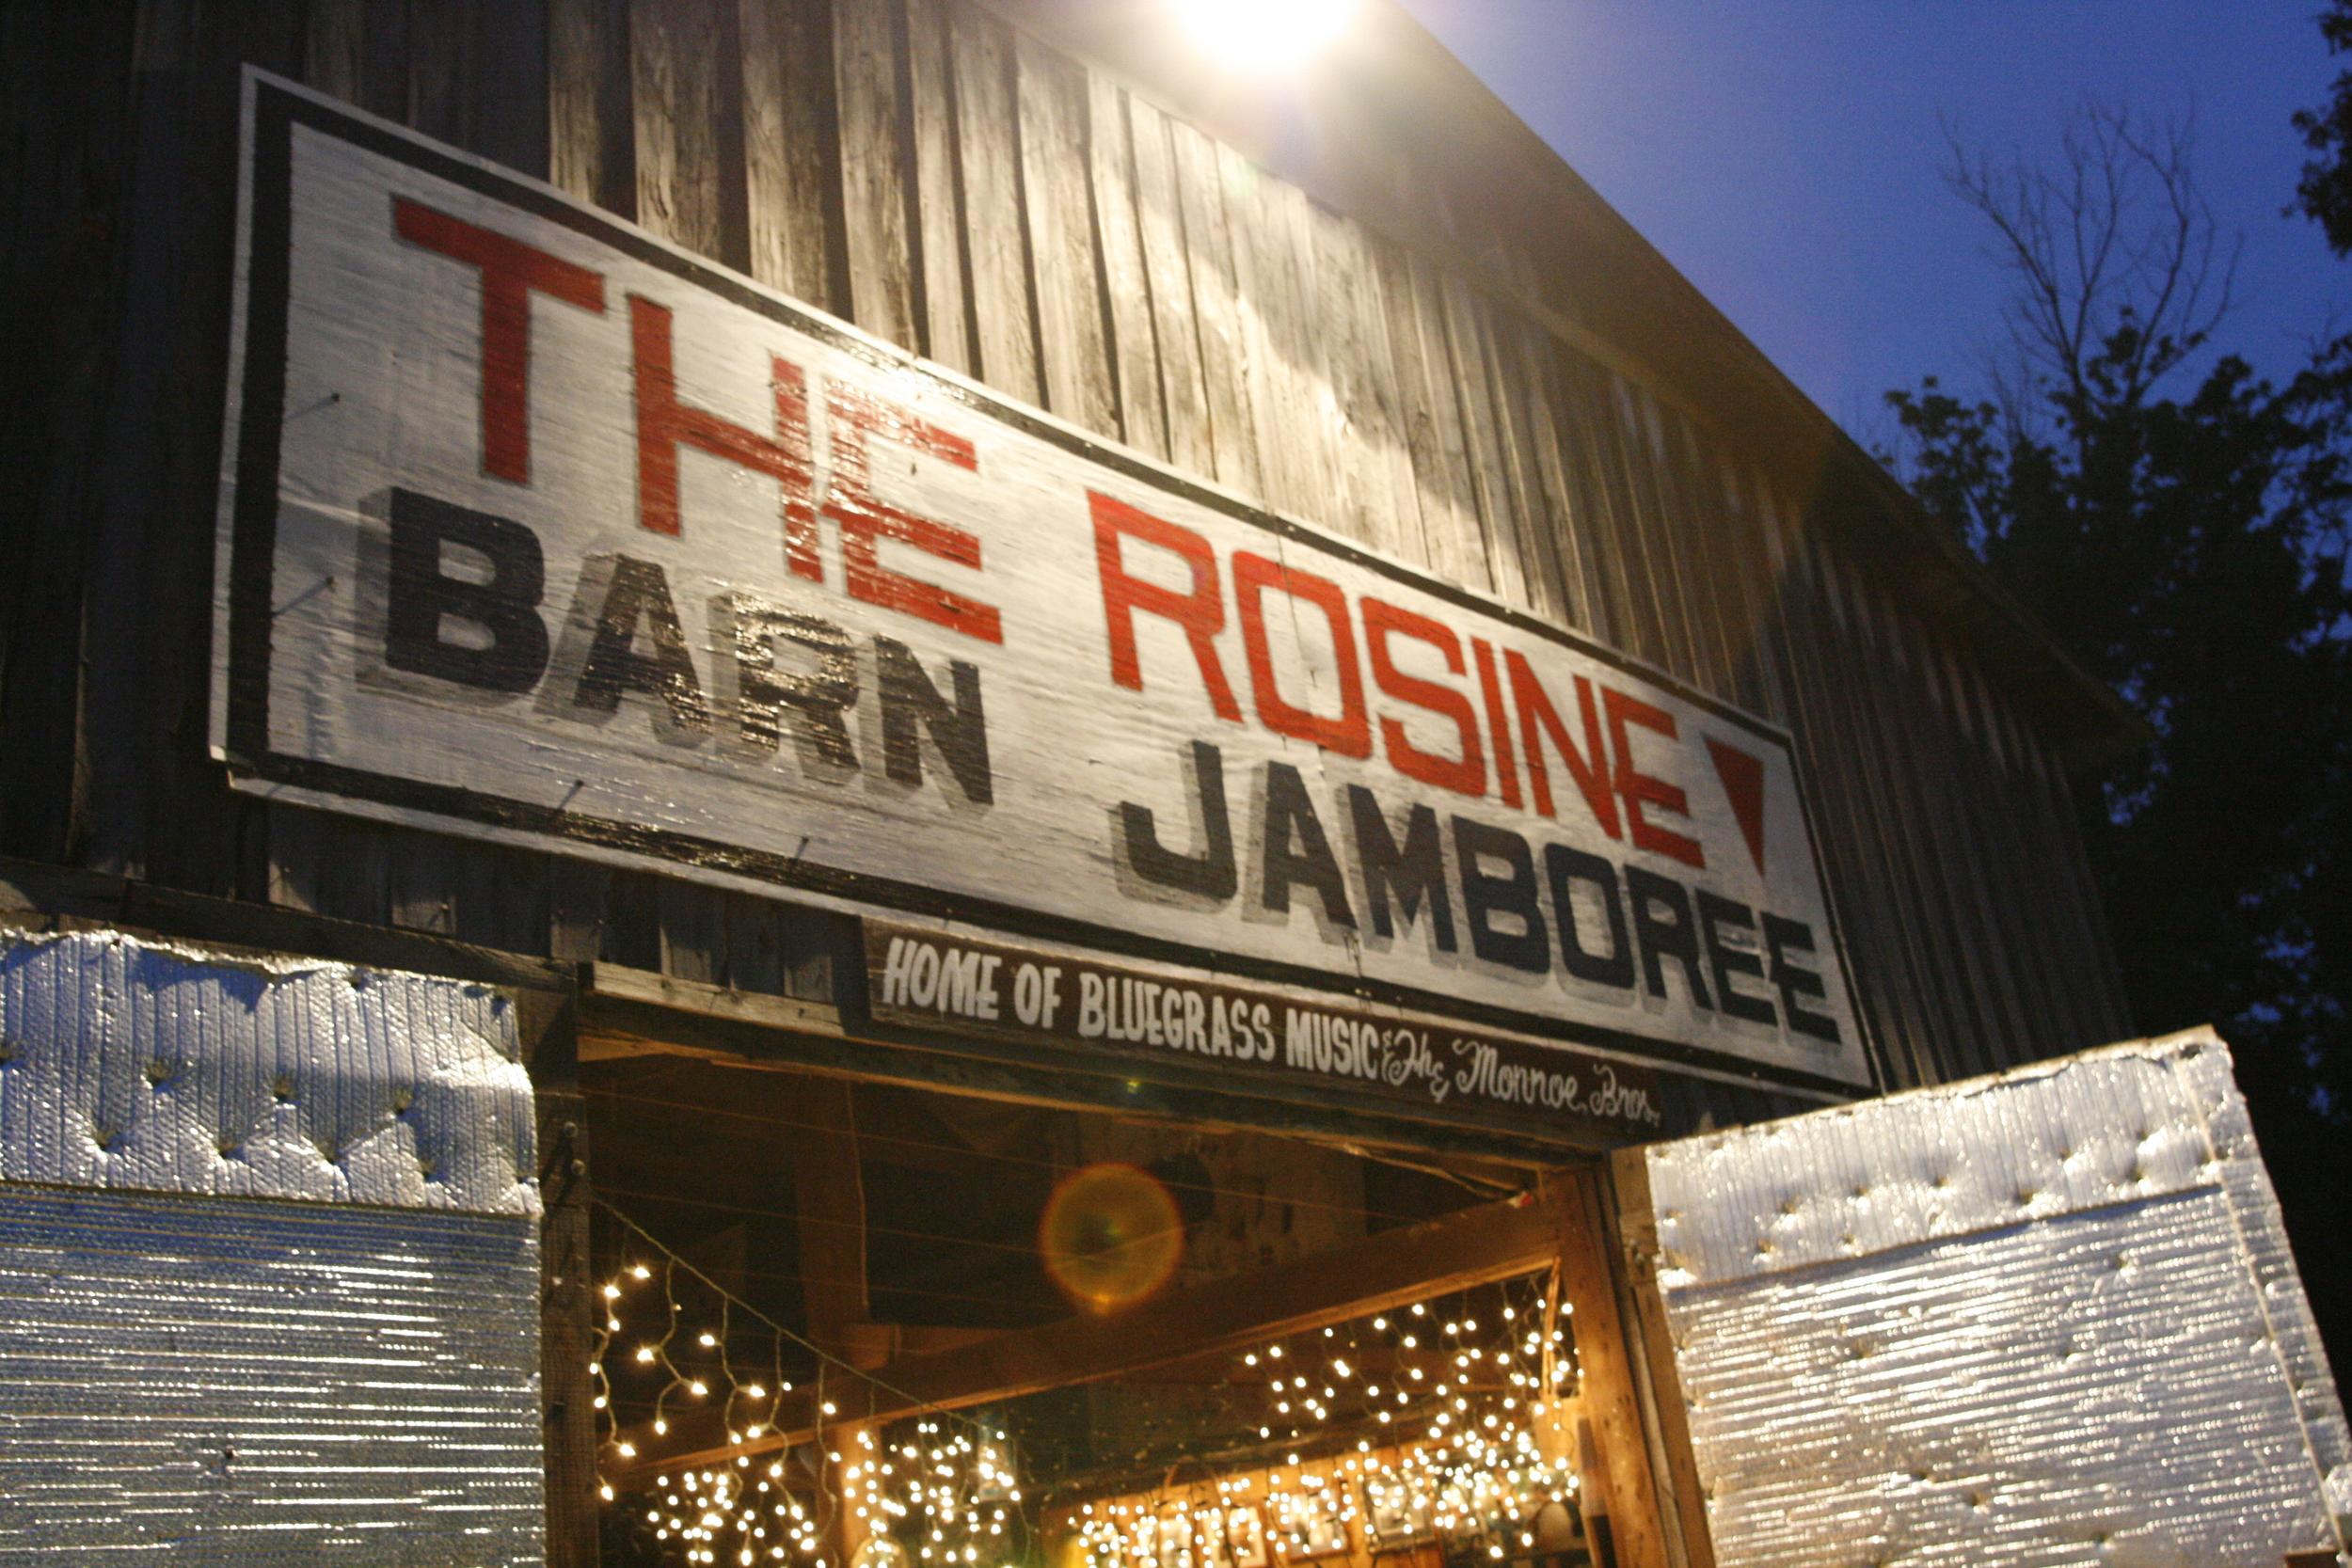 The Best of Rosine, Kentucky